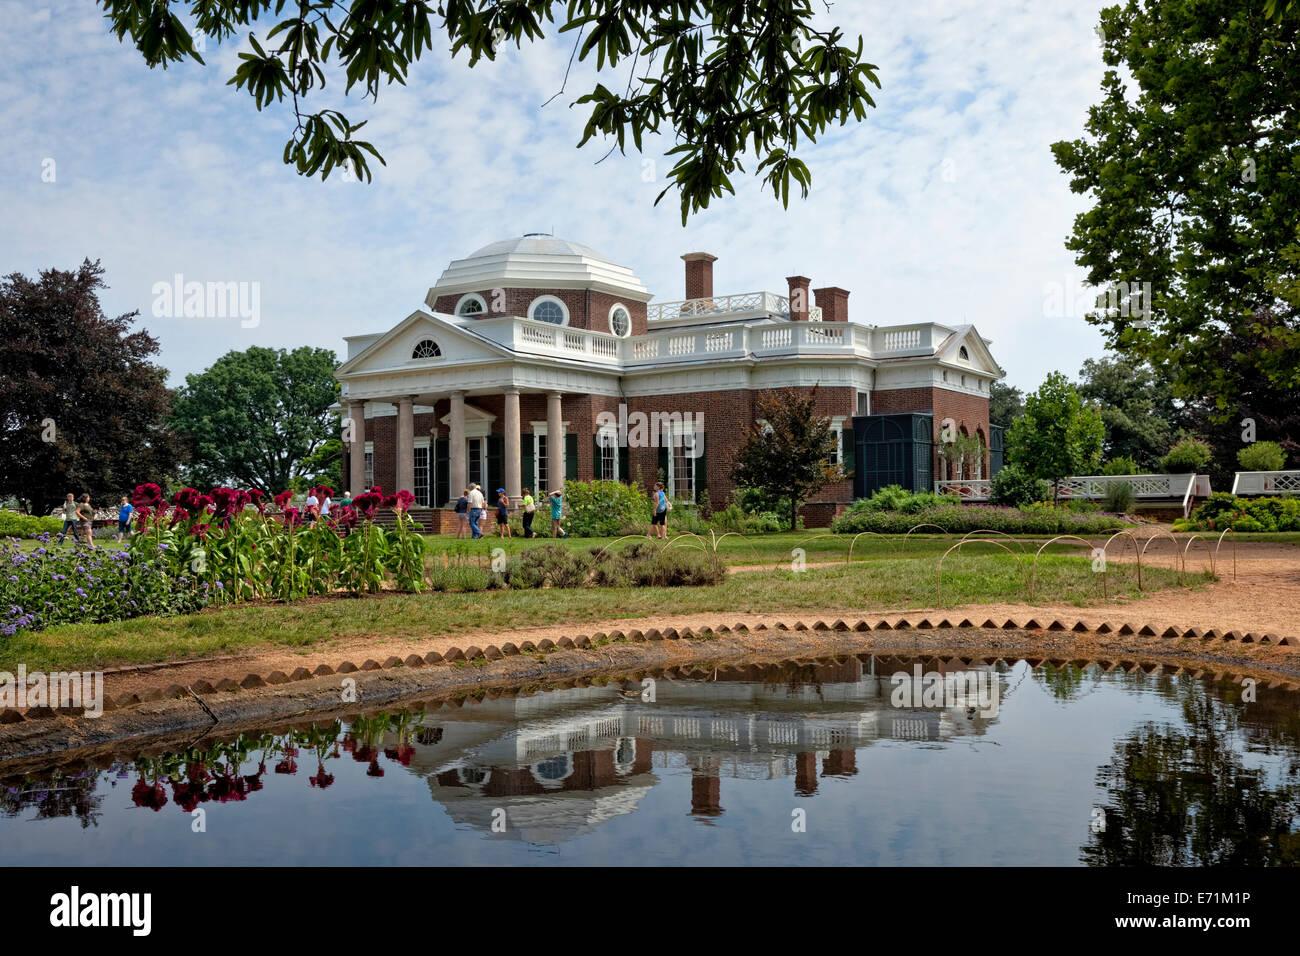 Thomas Jefferson Home - Monticello, VA Imagens de Stock